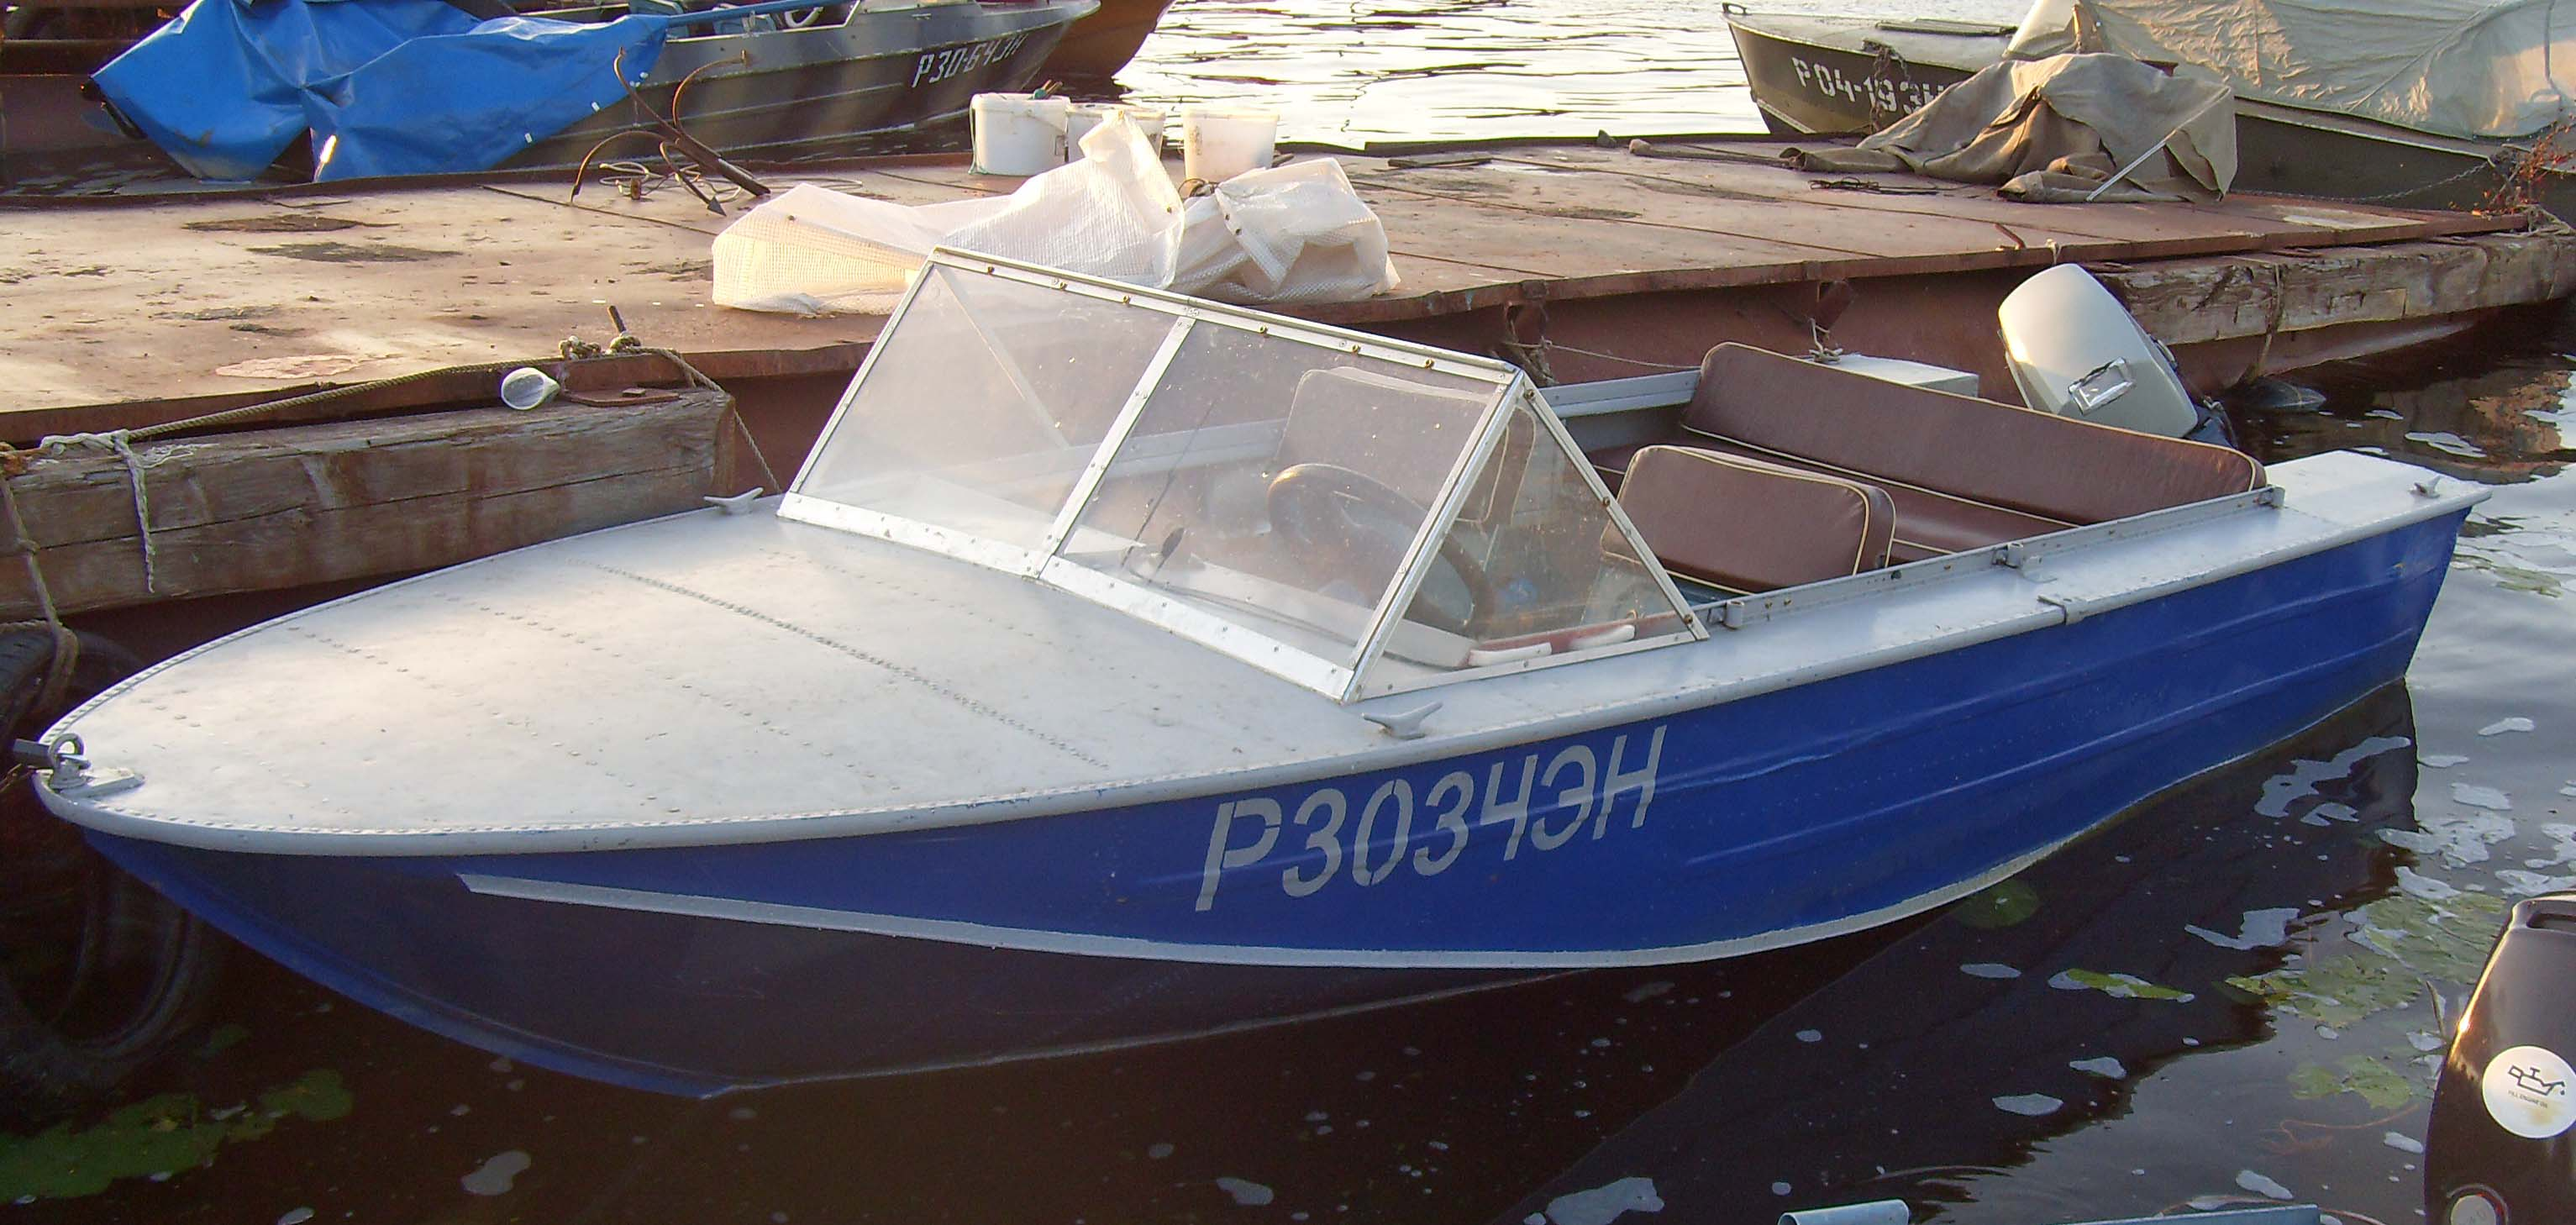 множество тюнинг лодки днепр рифленым амг фото берега храму